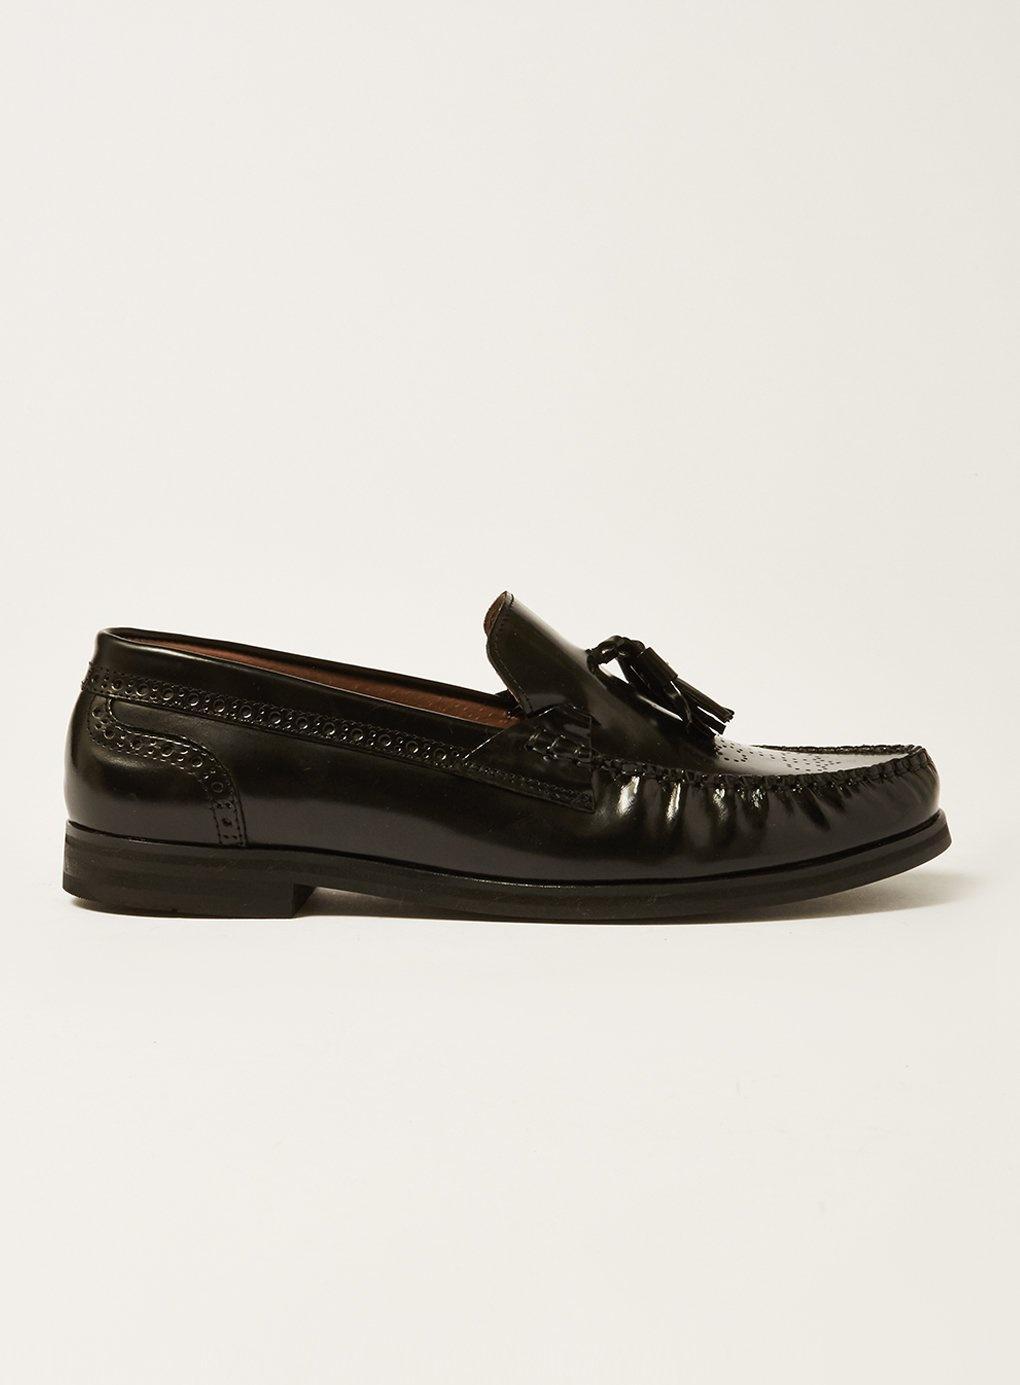 cfbda898763 House Of Hounds Sandleather Tassel Loafer in Black for Men - Lyst